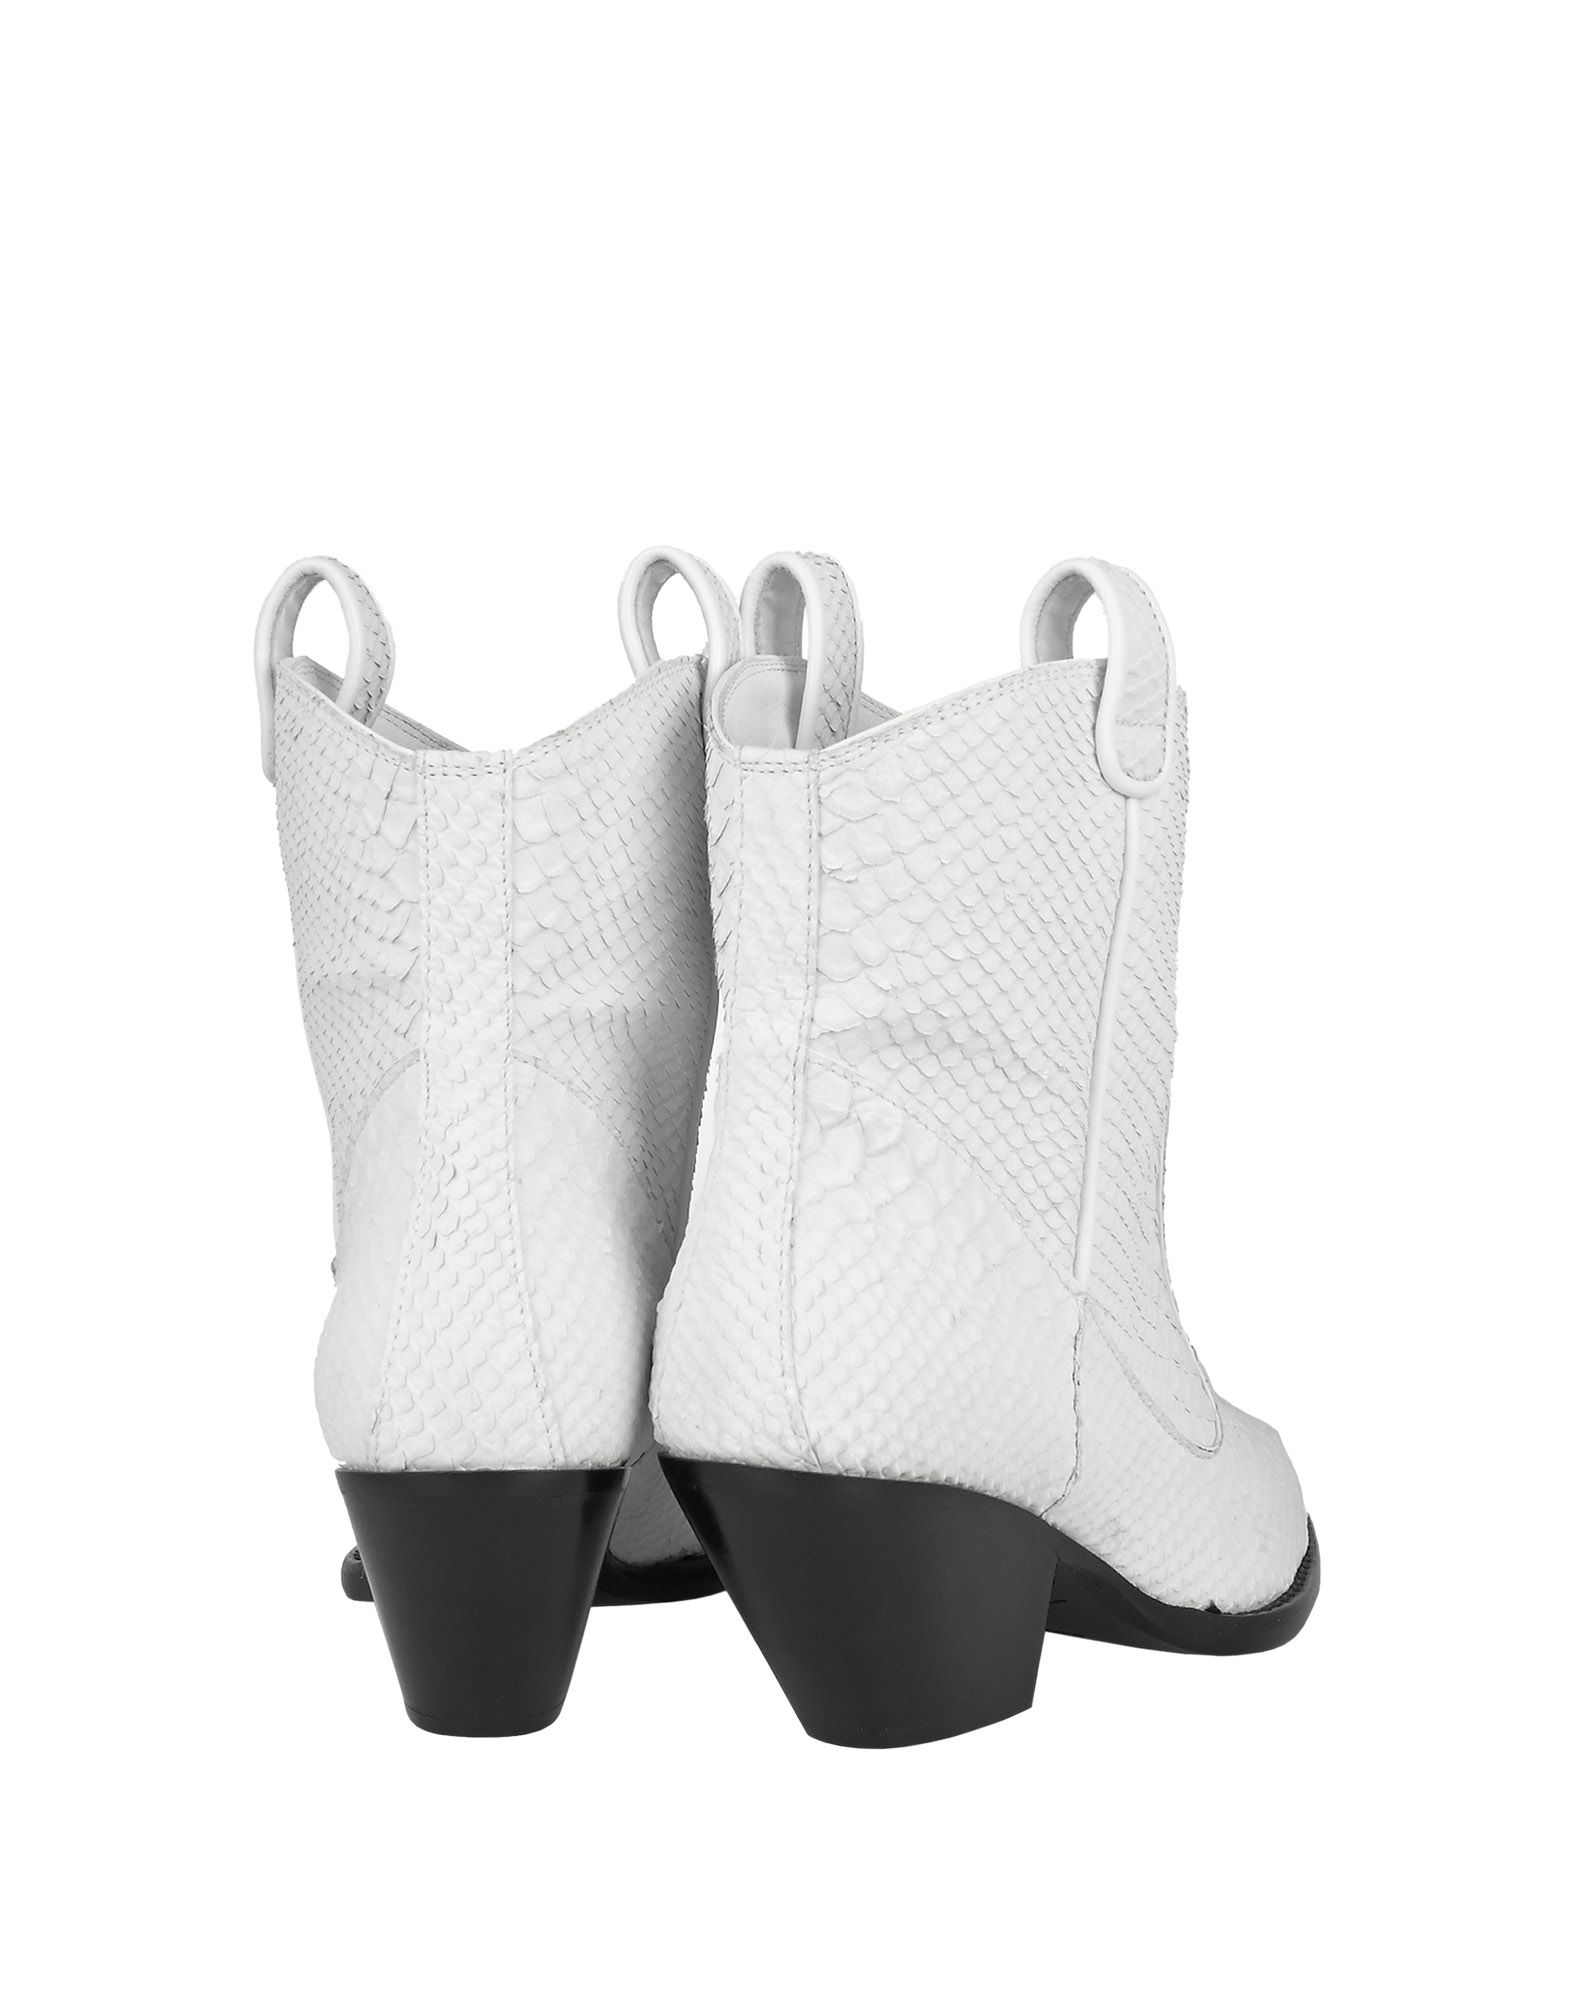 Giuseppe Zanotti Stiefelette Damen Schuhe  11524372LJGünstige gut aussehende Schuhe Damen eaed30